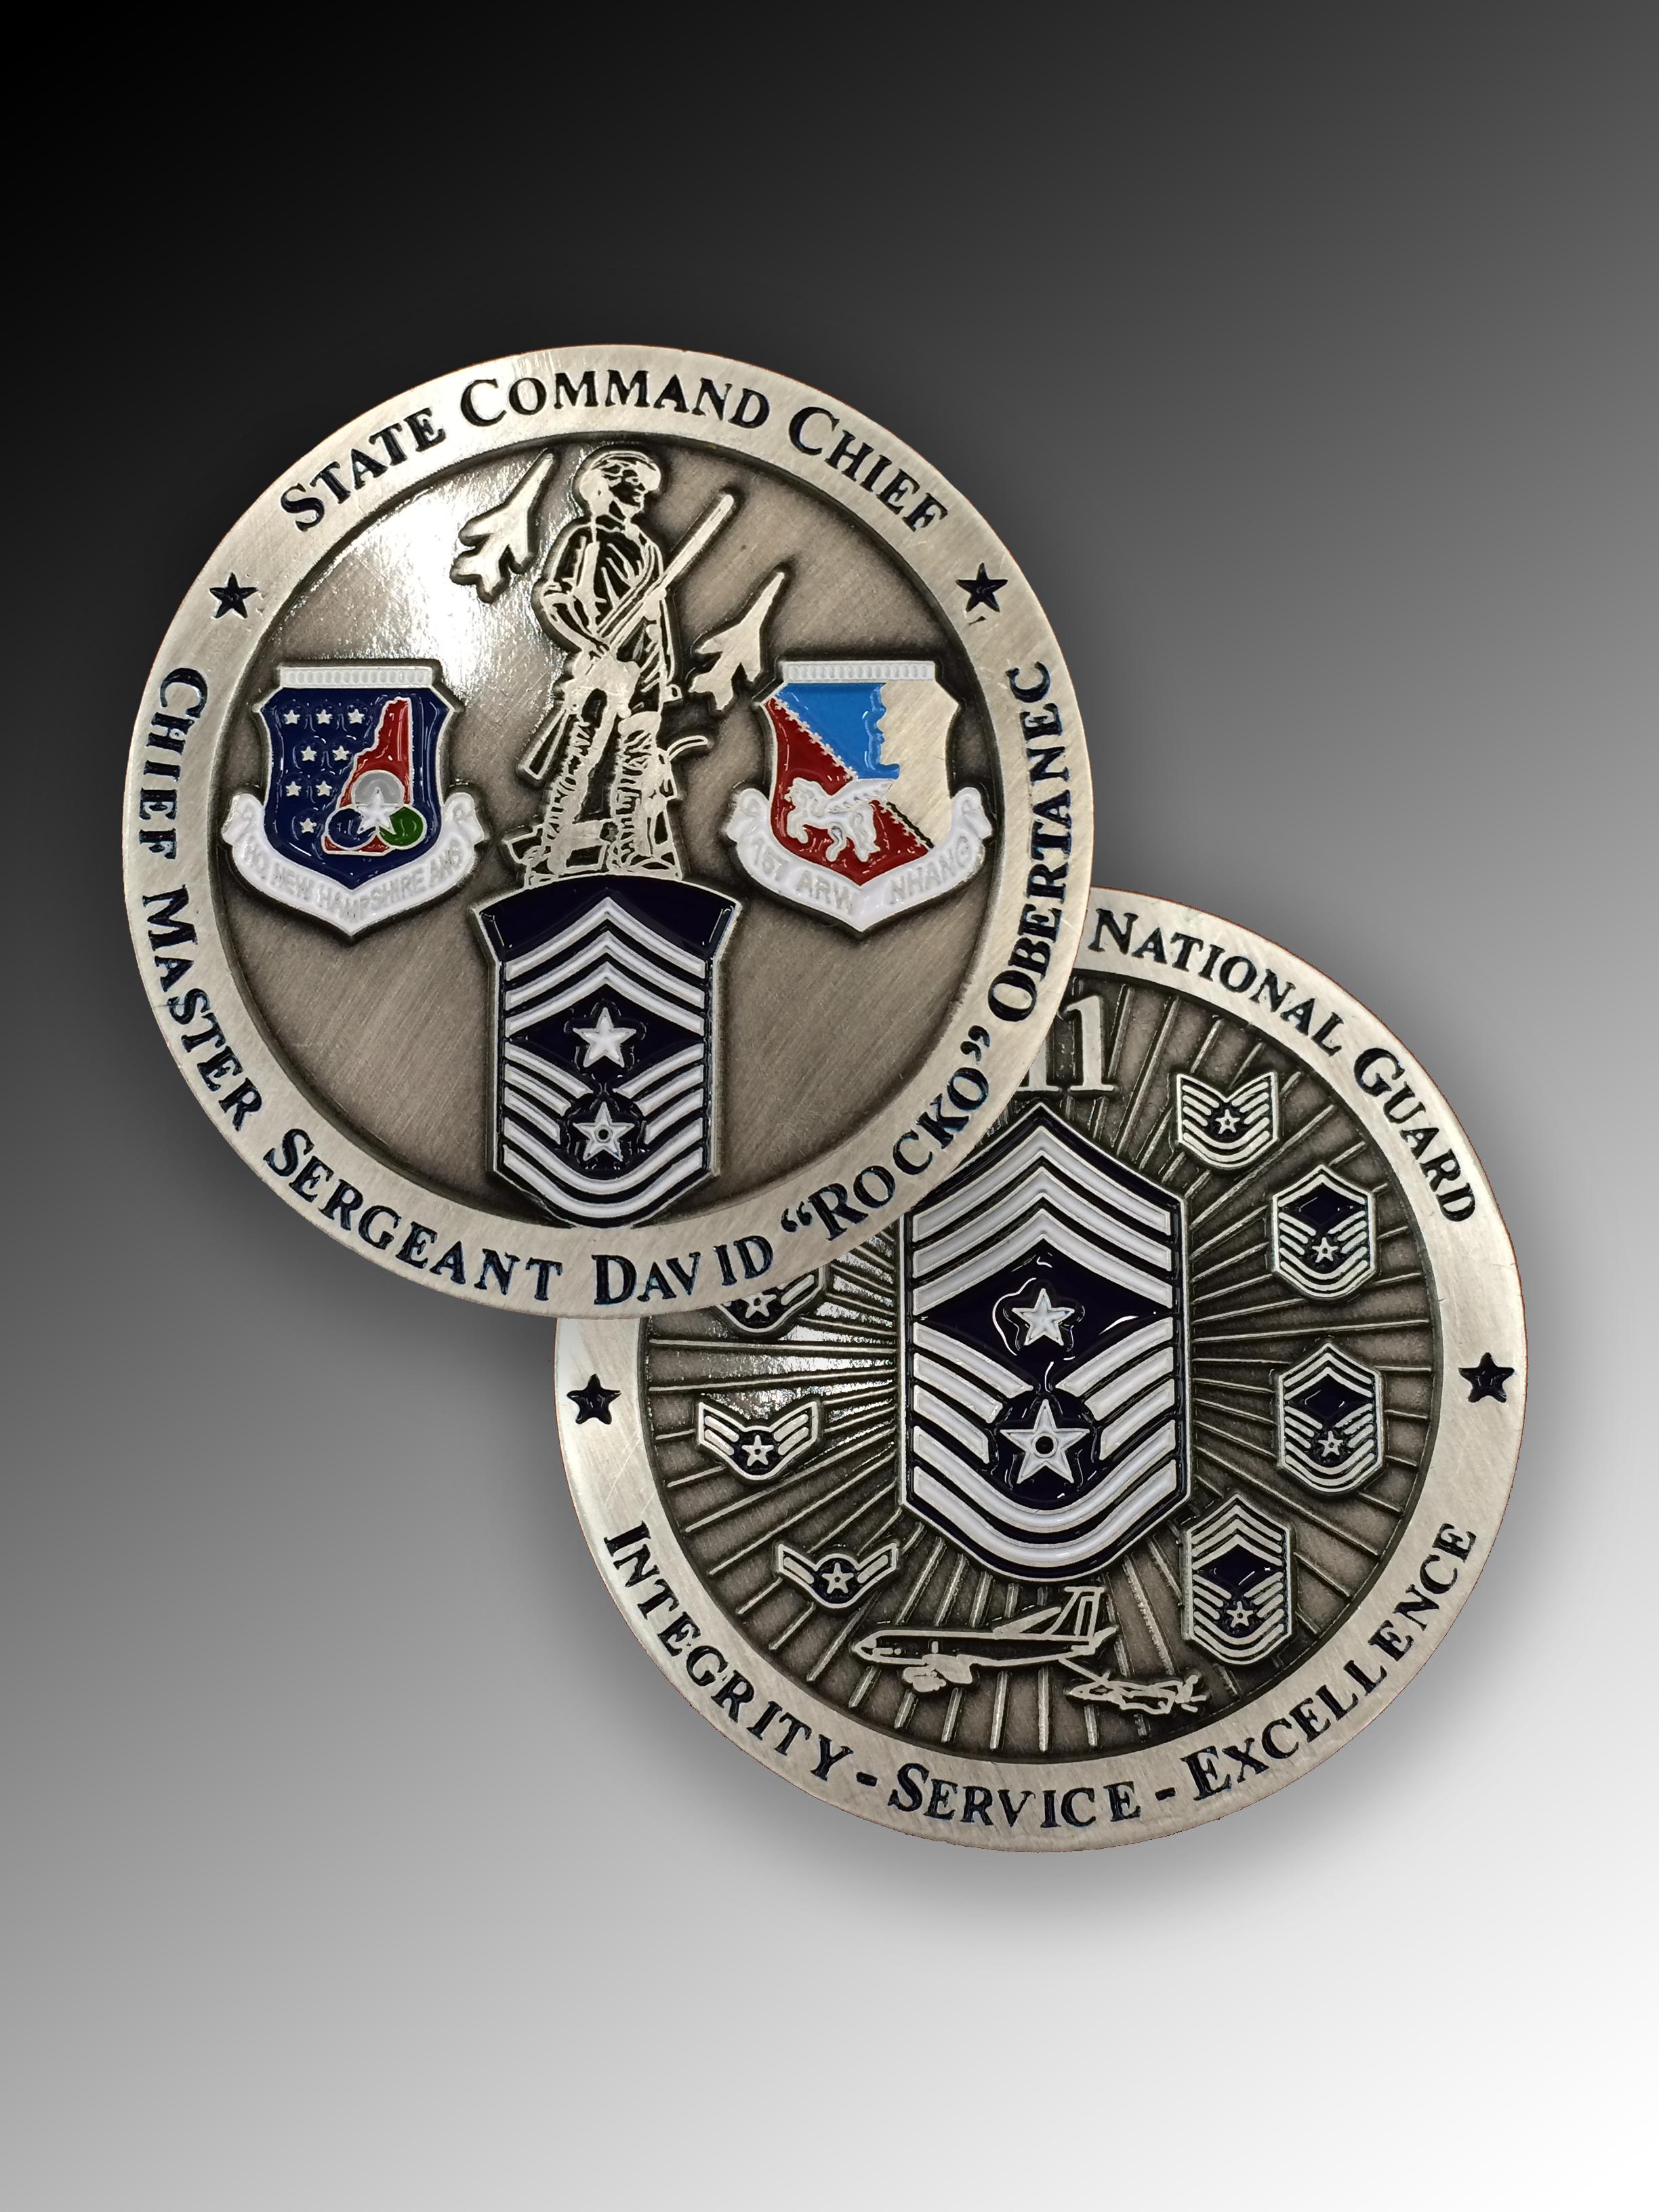 NH ANG_Command Chief coin